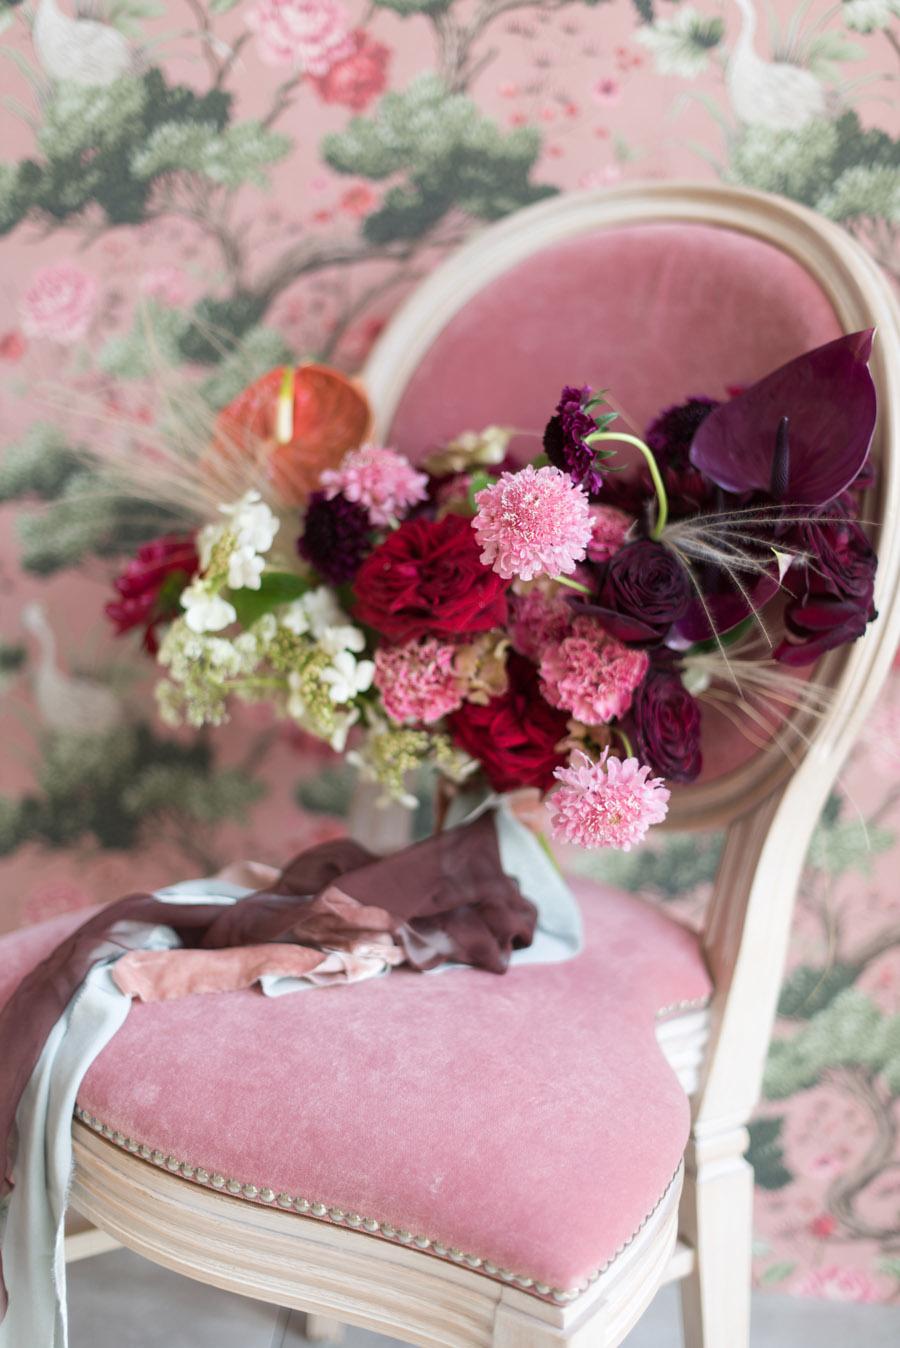 floral wedding ideas at Millbridge Court on English Wedding - photo credit Julie Michaelsen Photography (17)